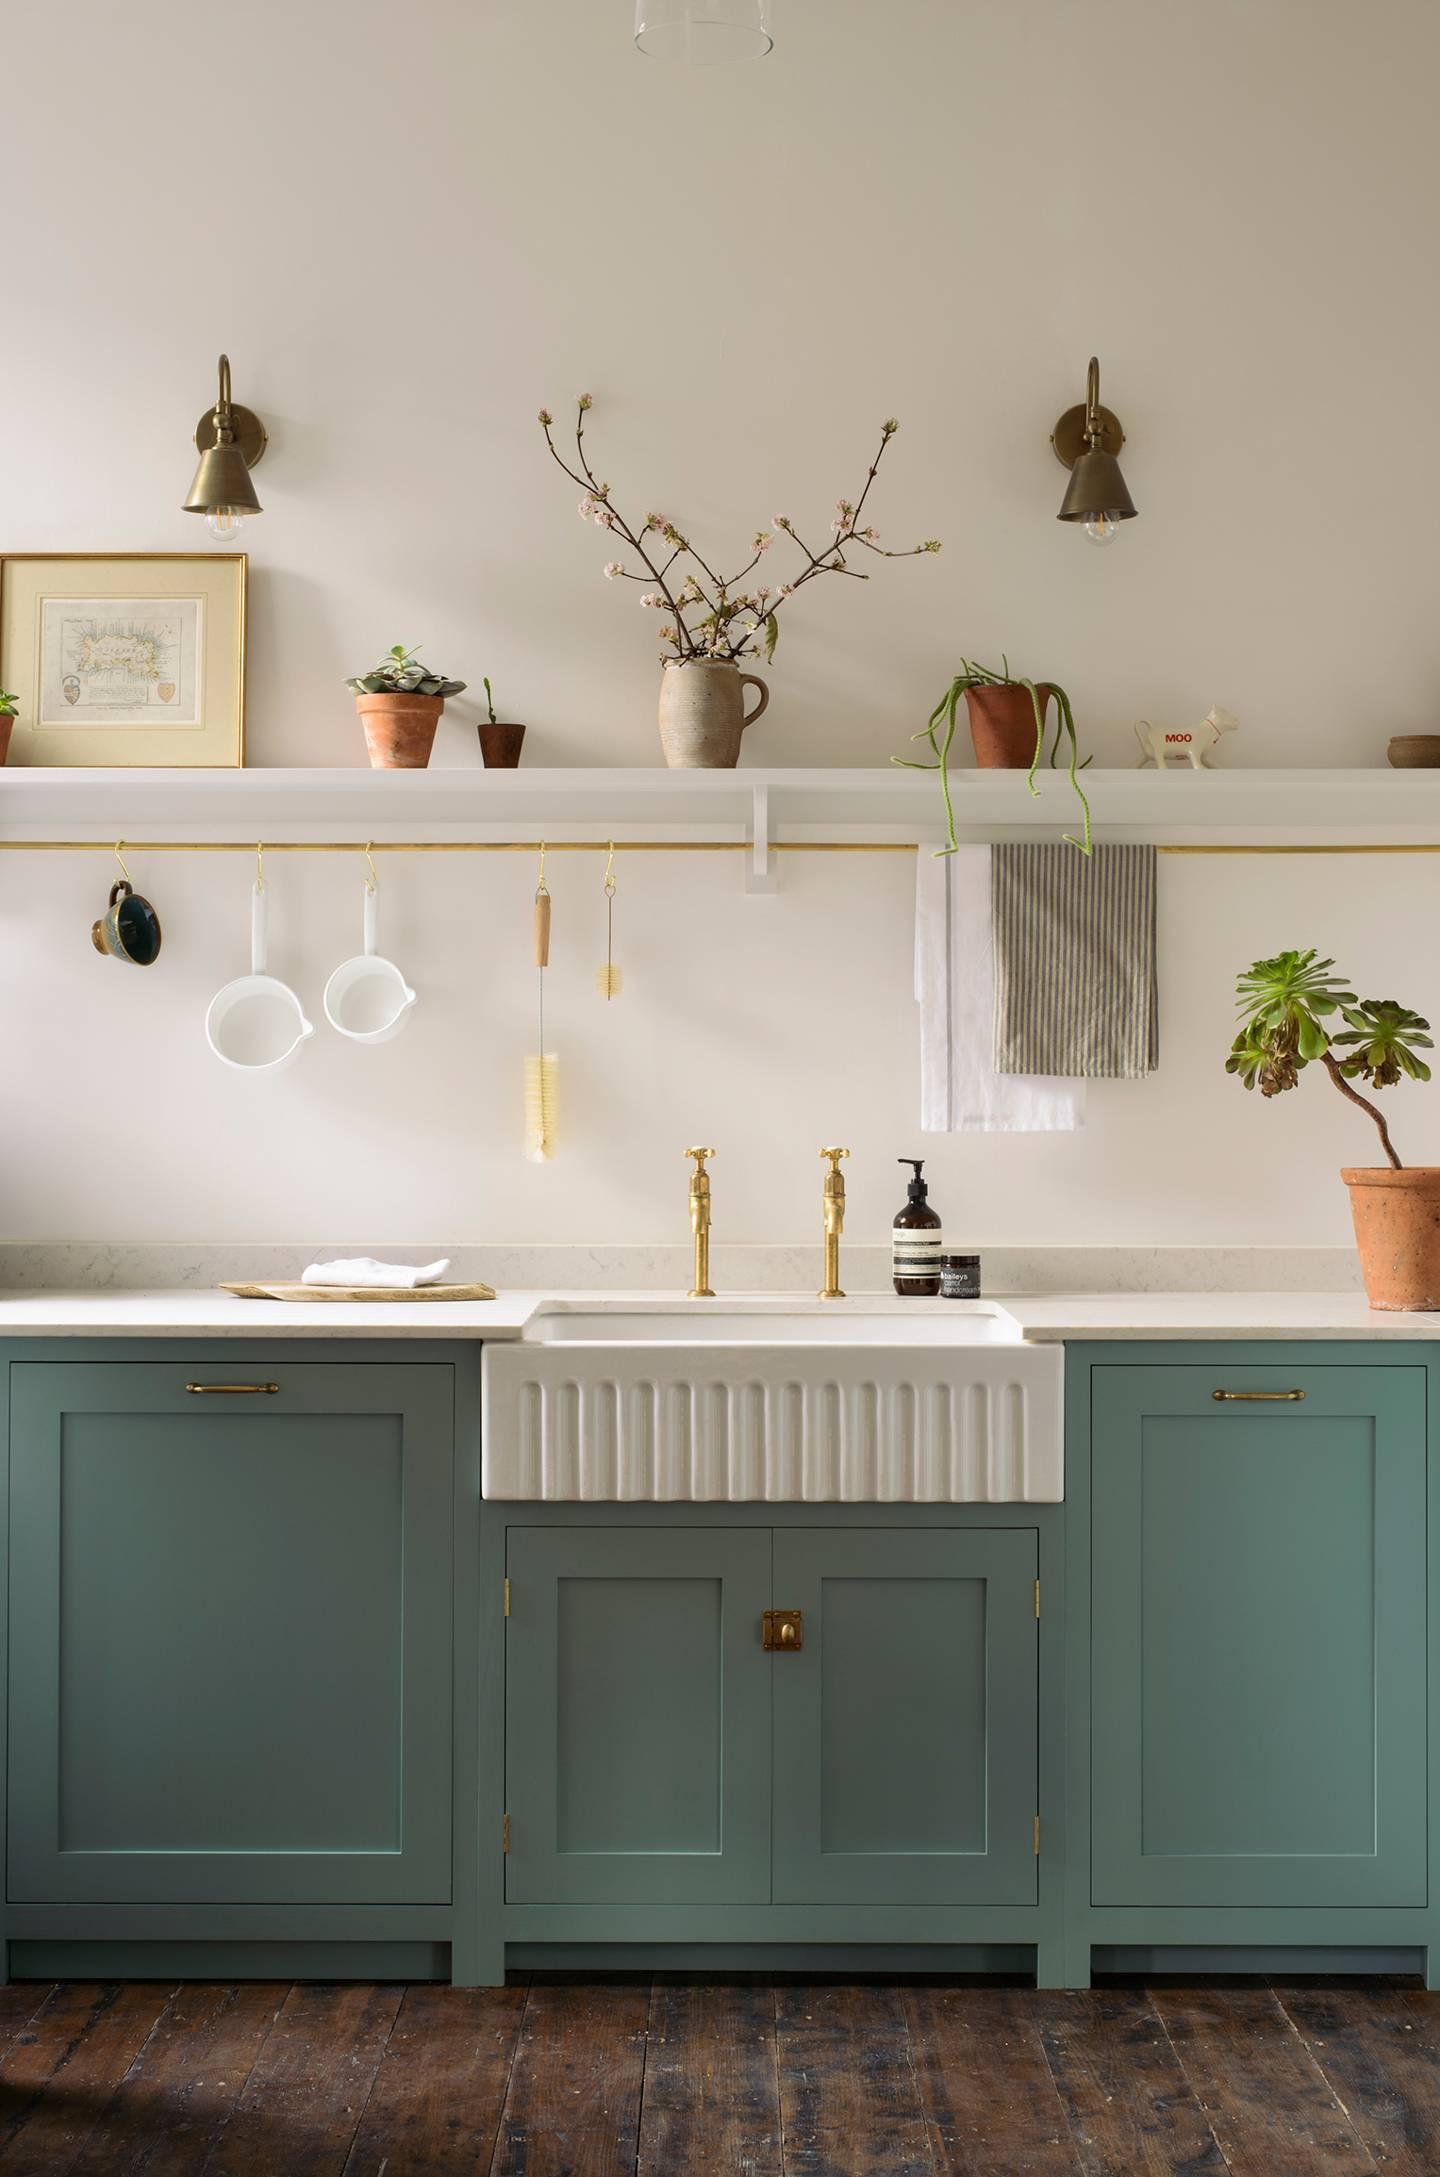 Kitchen case study: a DeVol kitchen in an Edwardian house